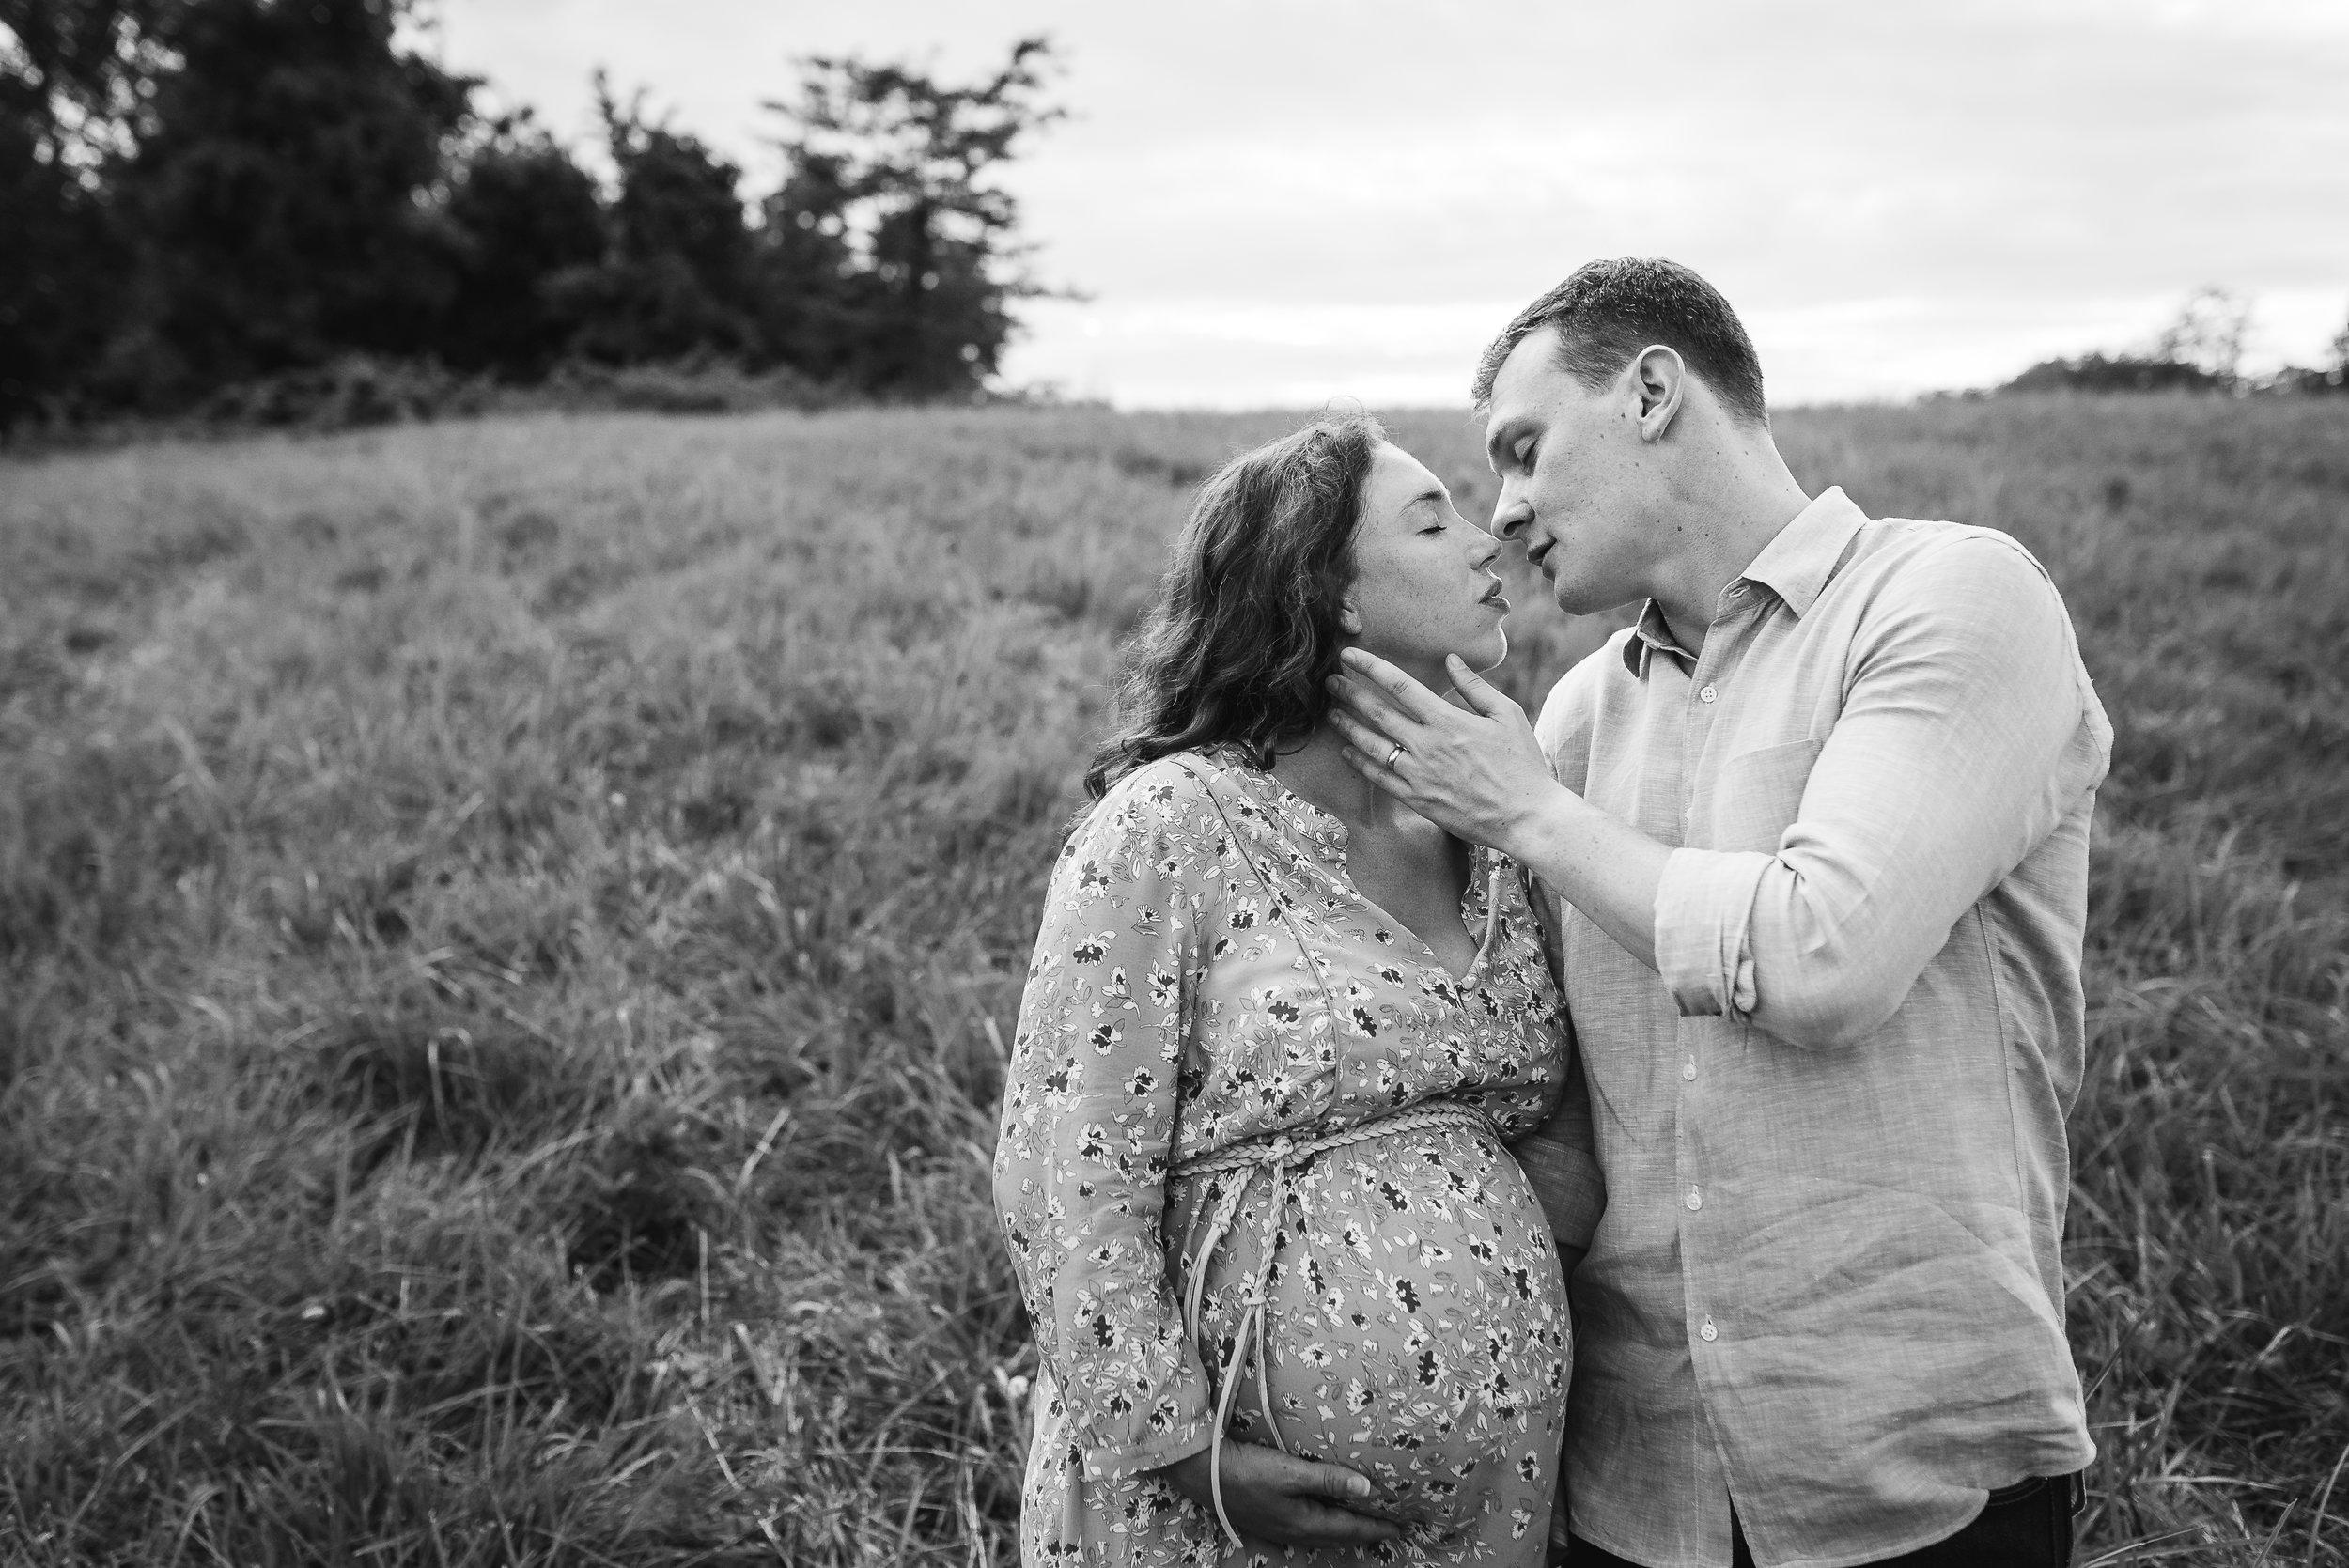 hughes maternity loudoun county photographer-18.jpg